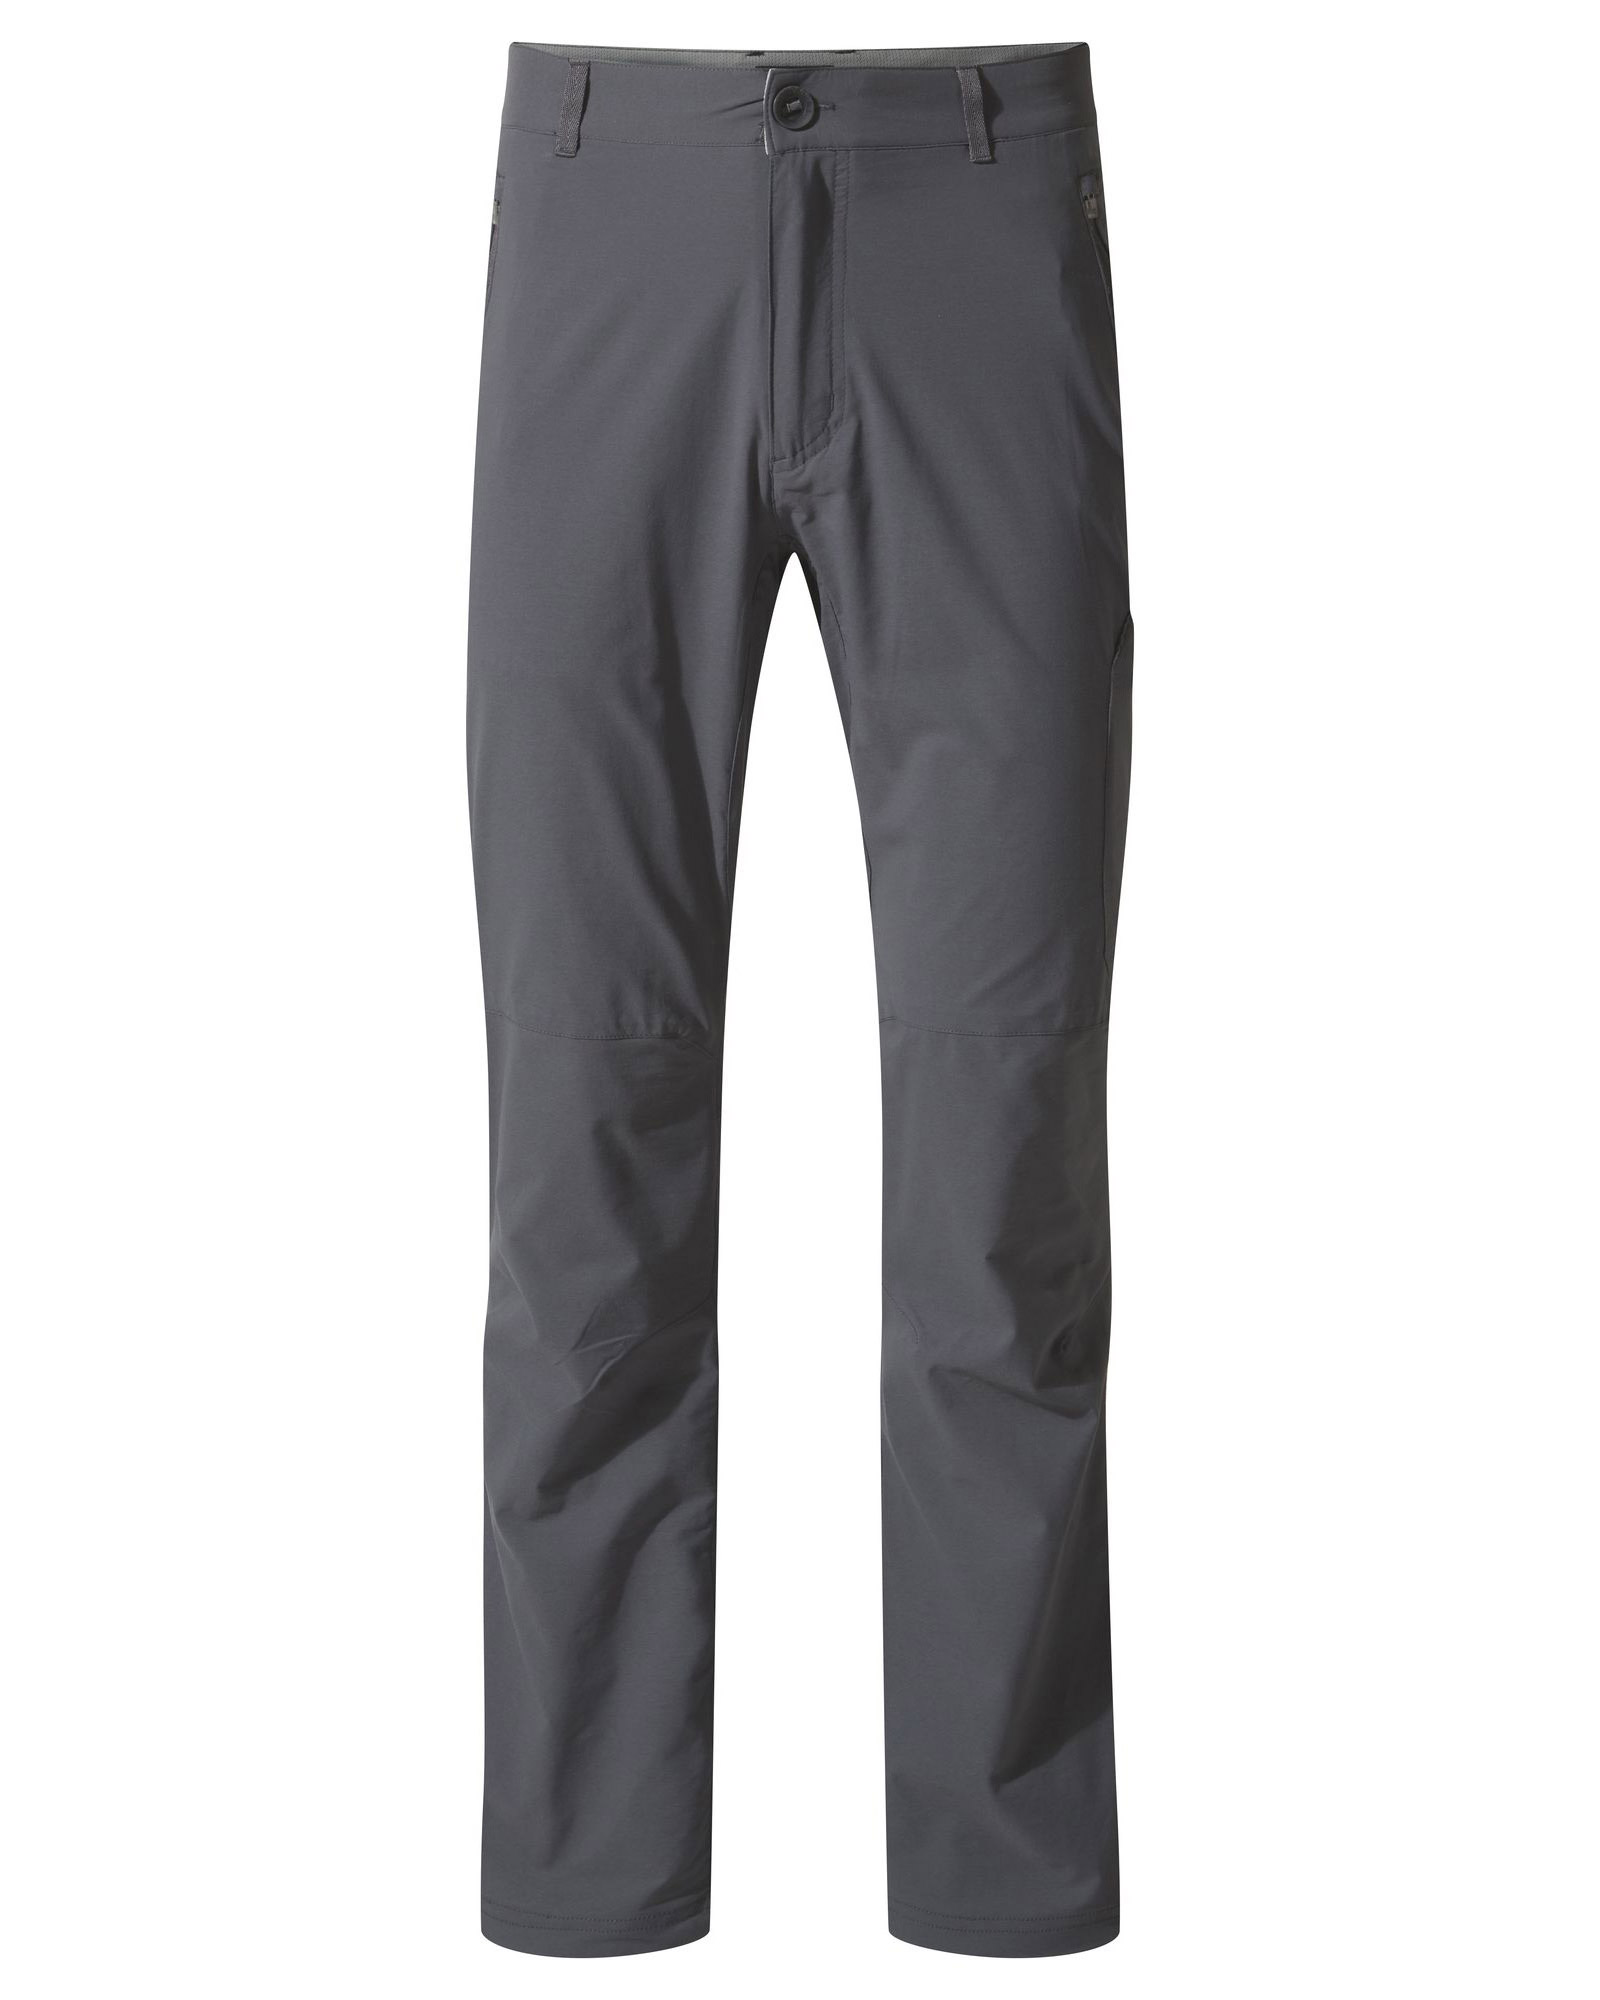 Craghoppers Men's NosiLife Pro Stretch Pants 0